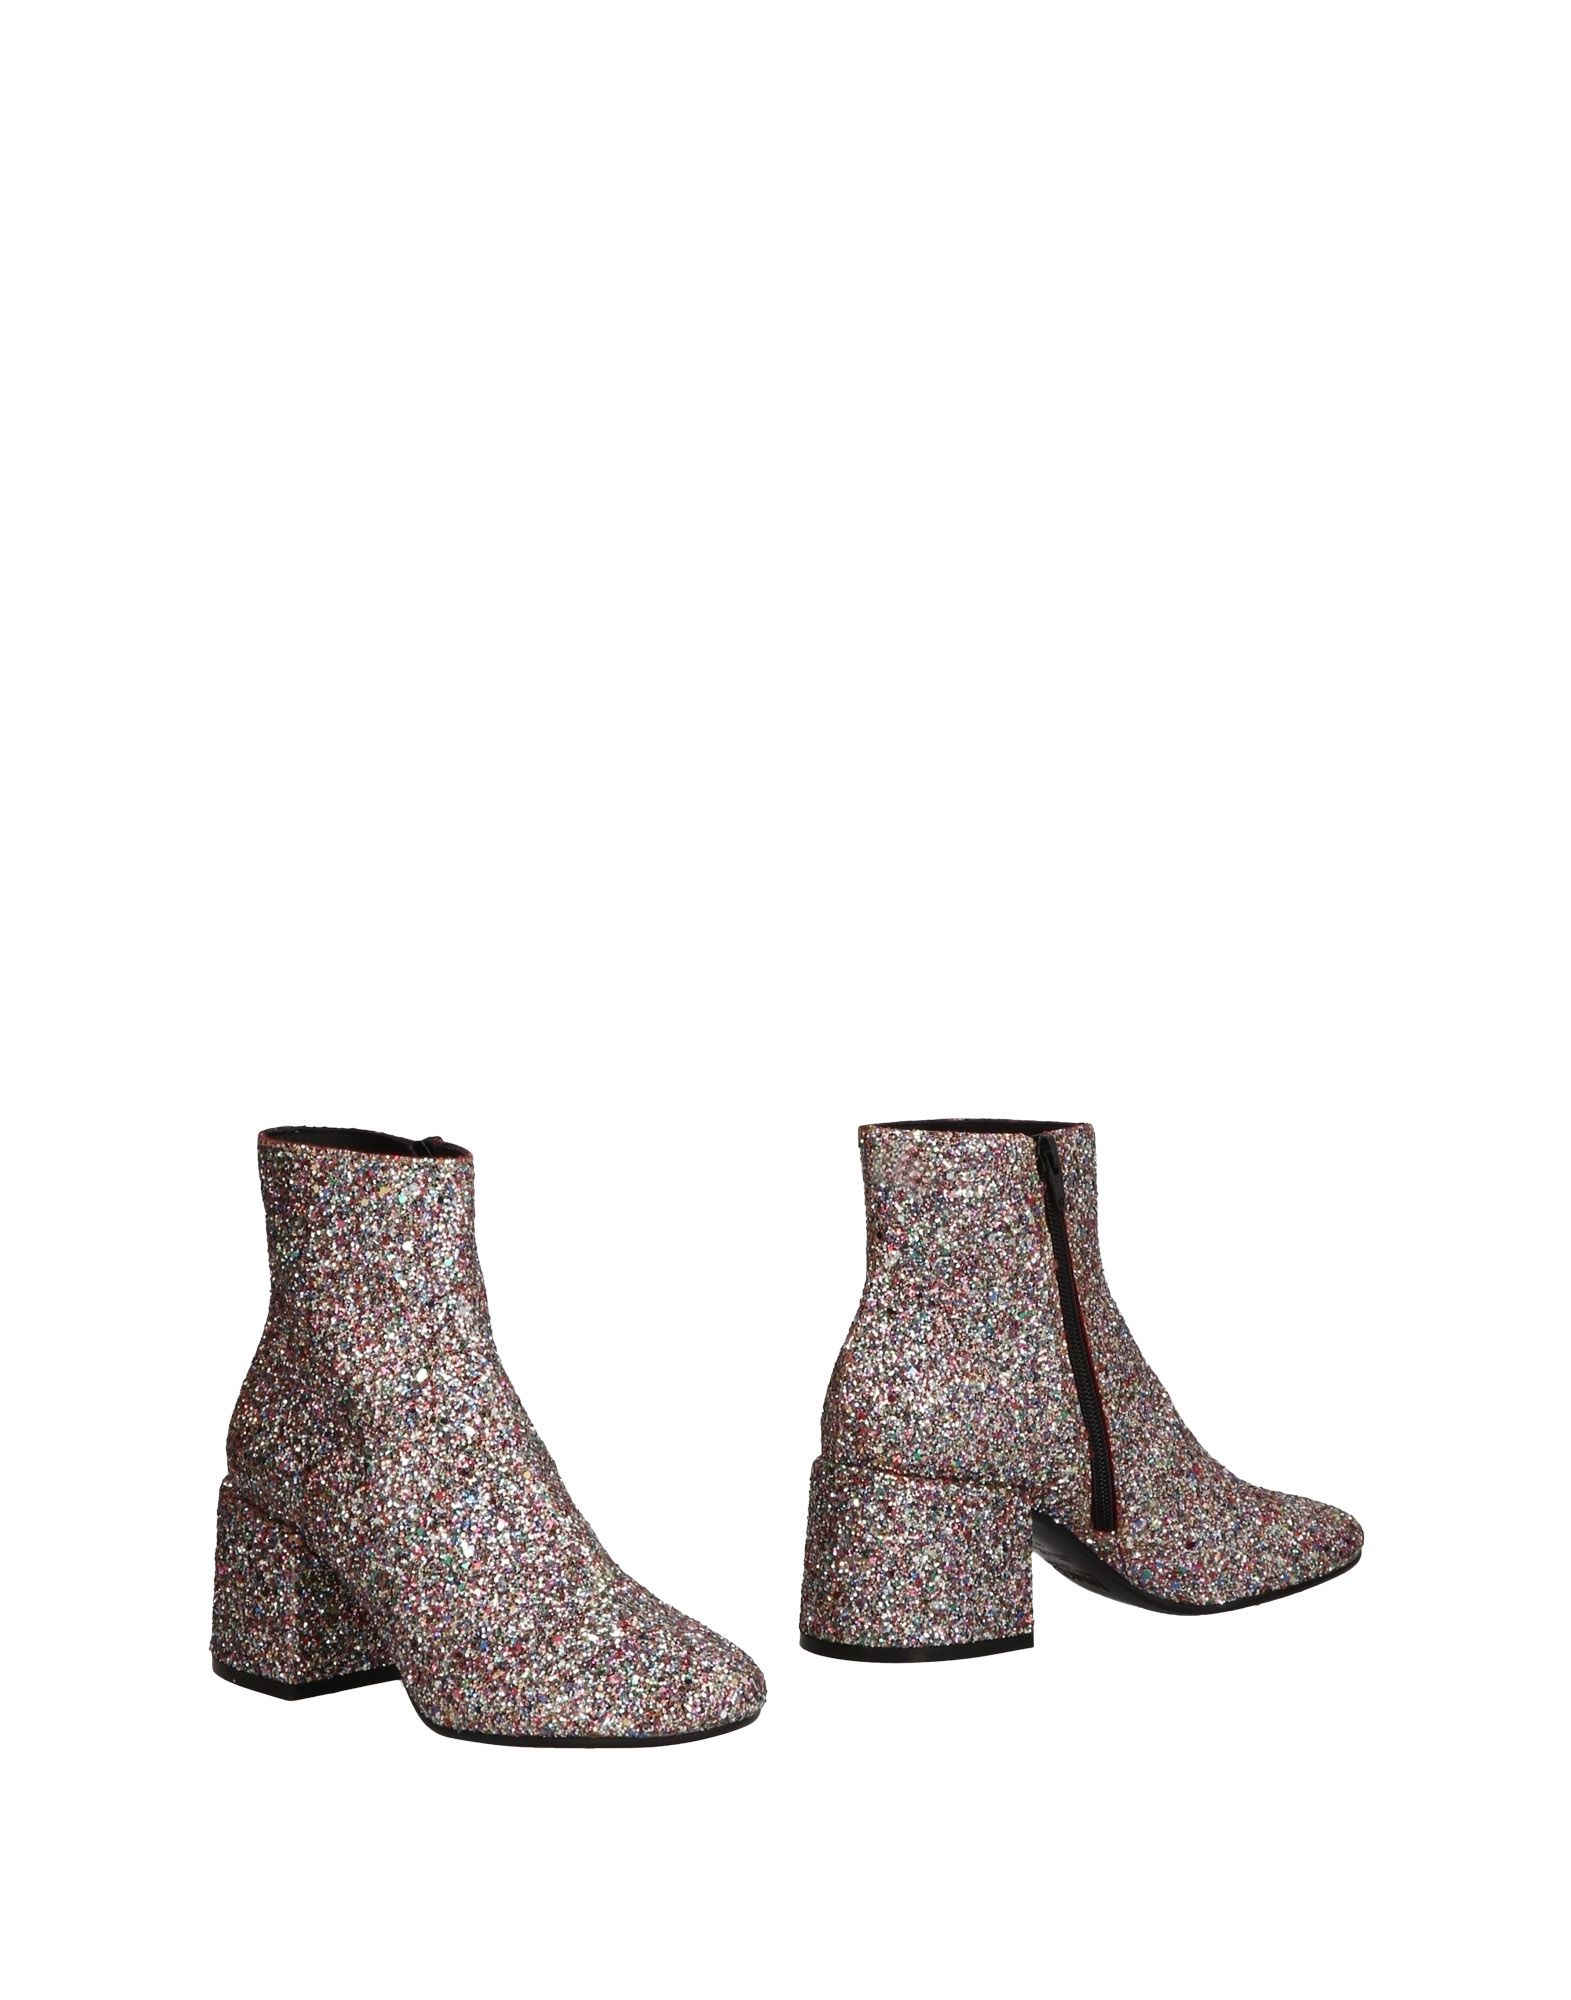 Rabatt Schuhe Maison 11465545XL Margiela Stiefelette Damen  11465545XL Maison 81631c